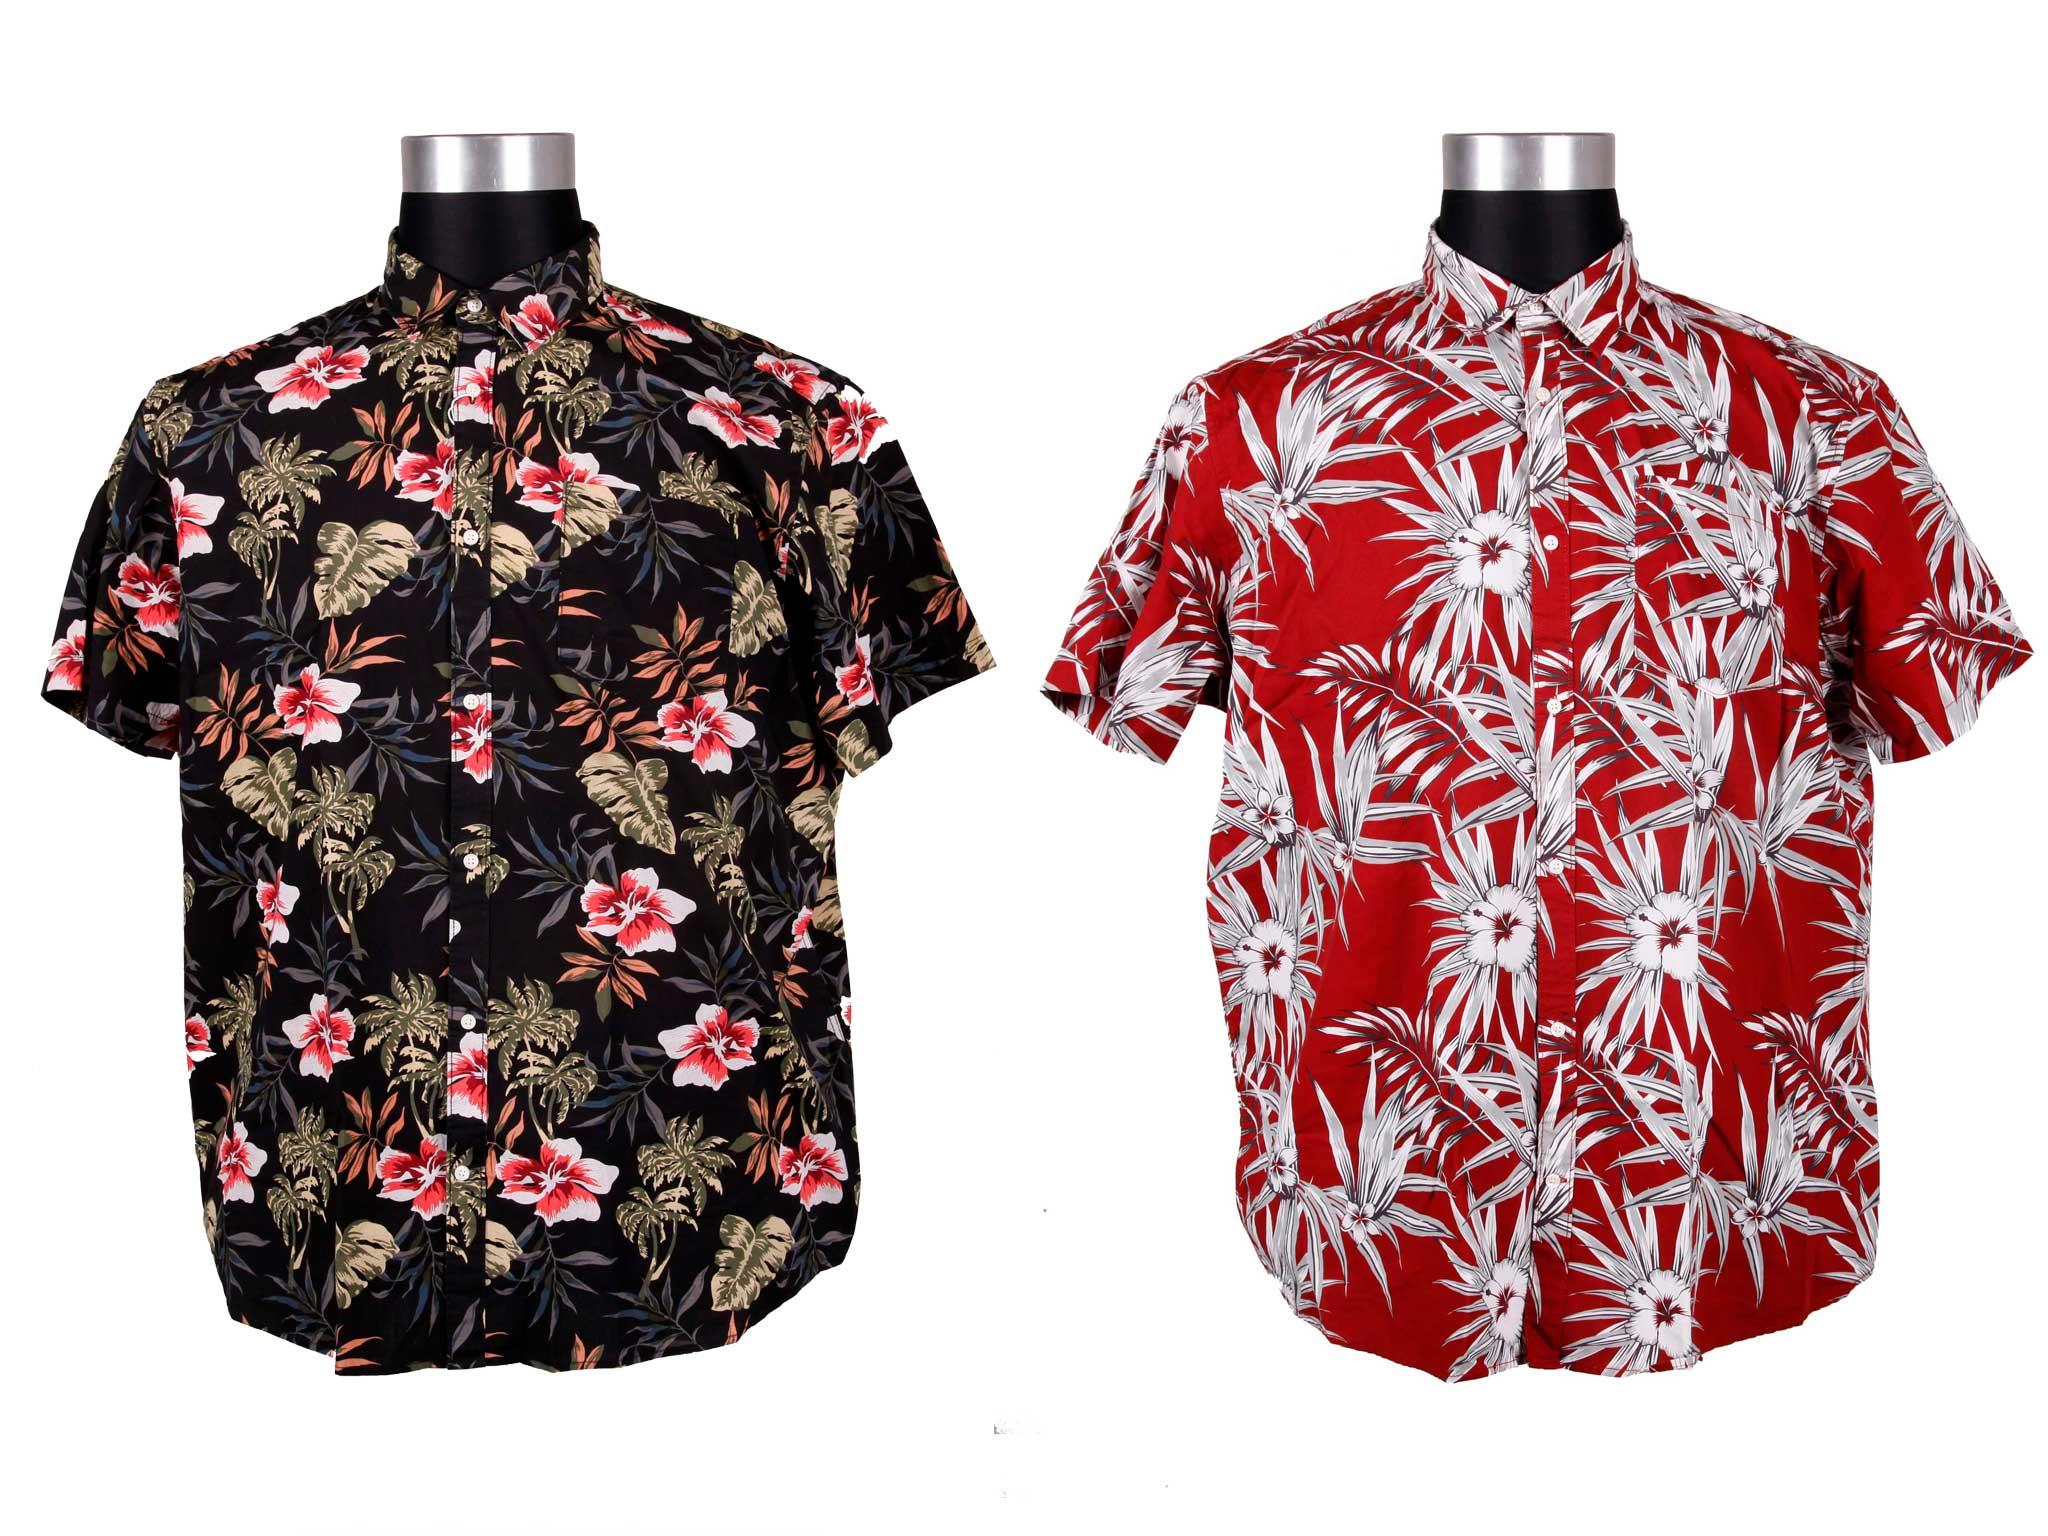 Ralph Lauren skjorter| Kæmpe udvalg |Nextdress.dk